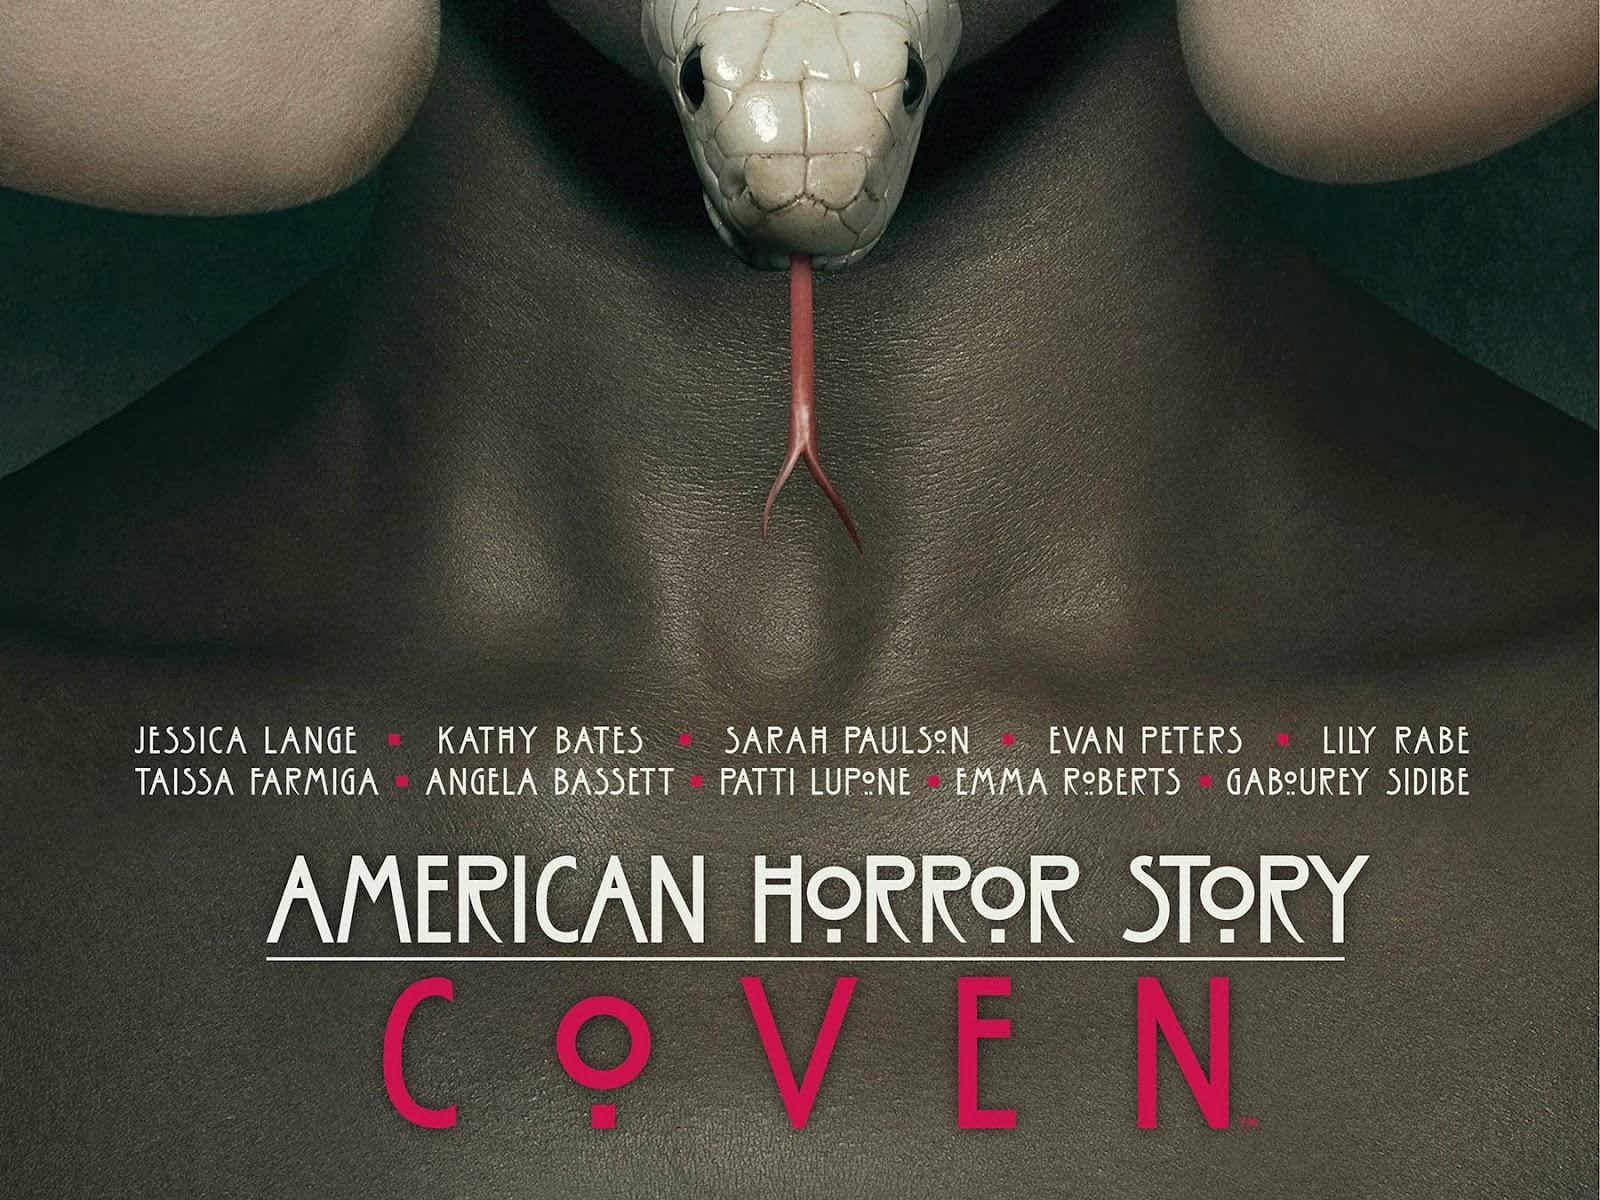 American Horror Story, Season 3, Episode 1 |Jigsaw's Lair